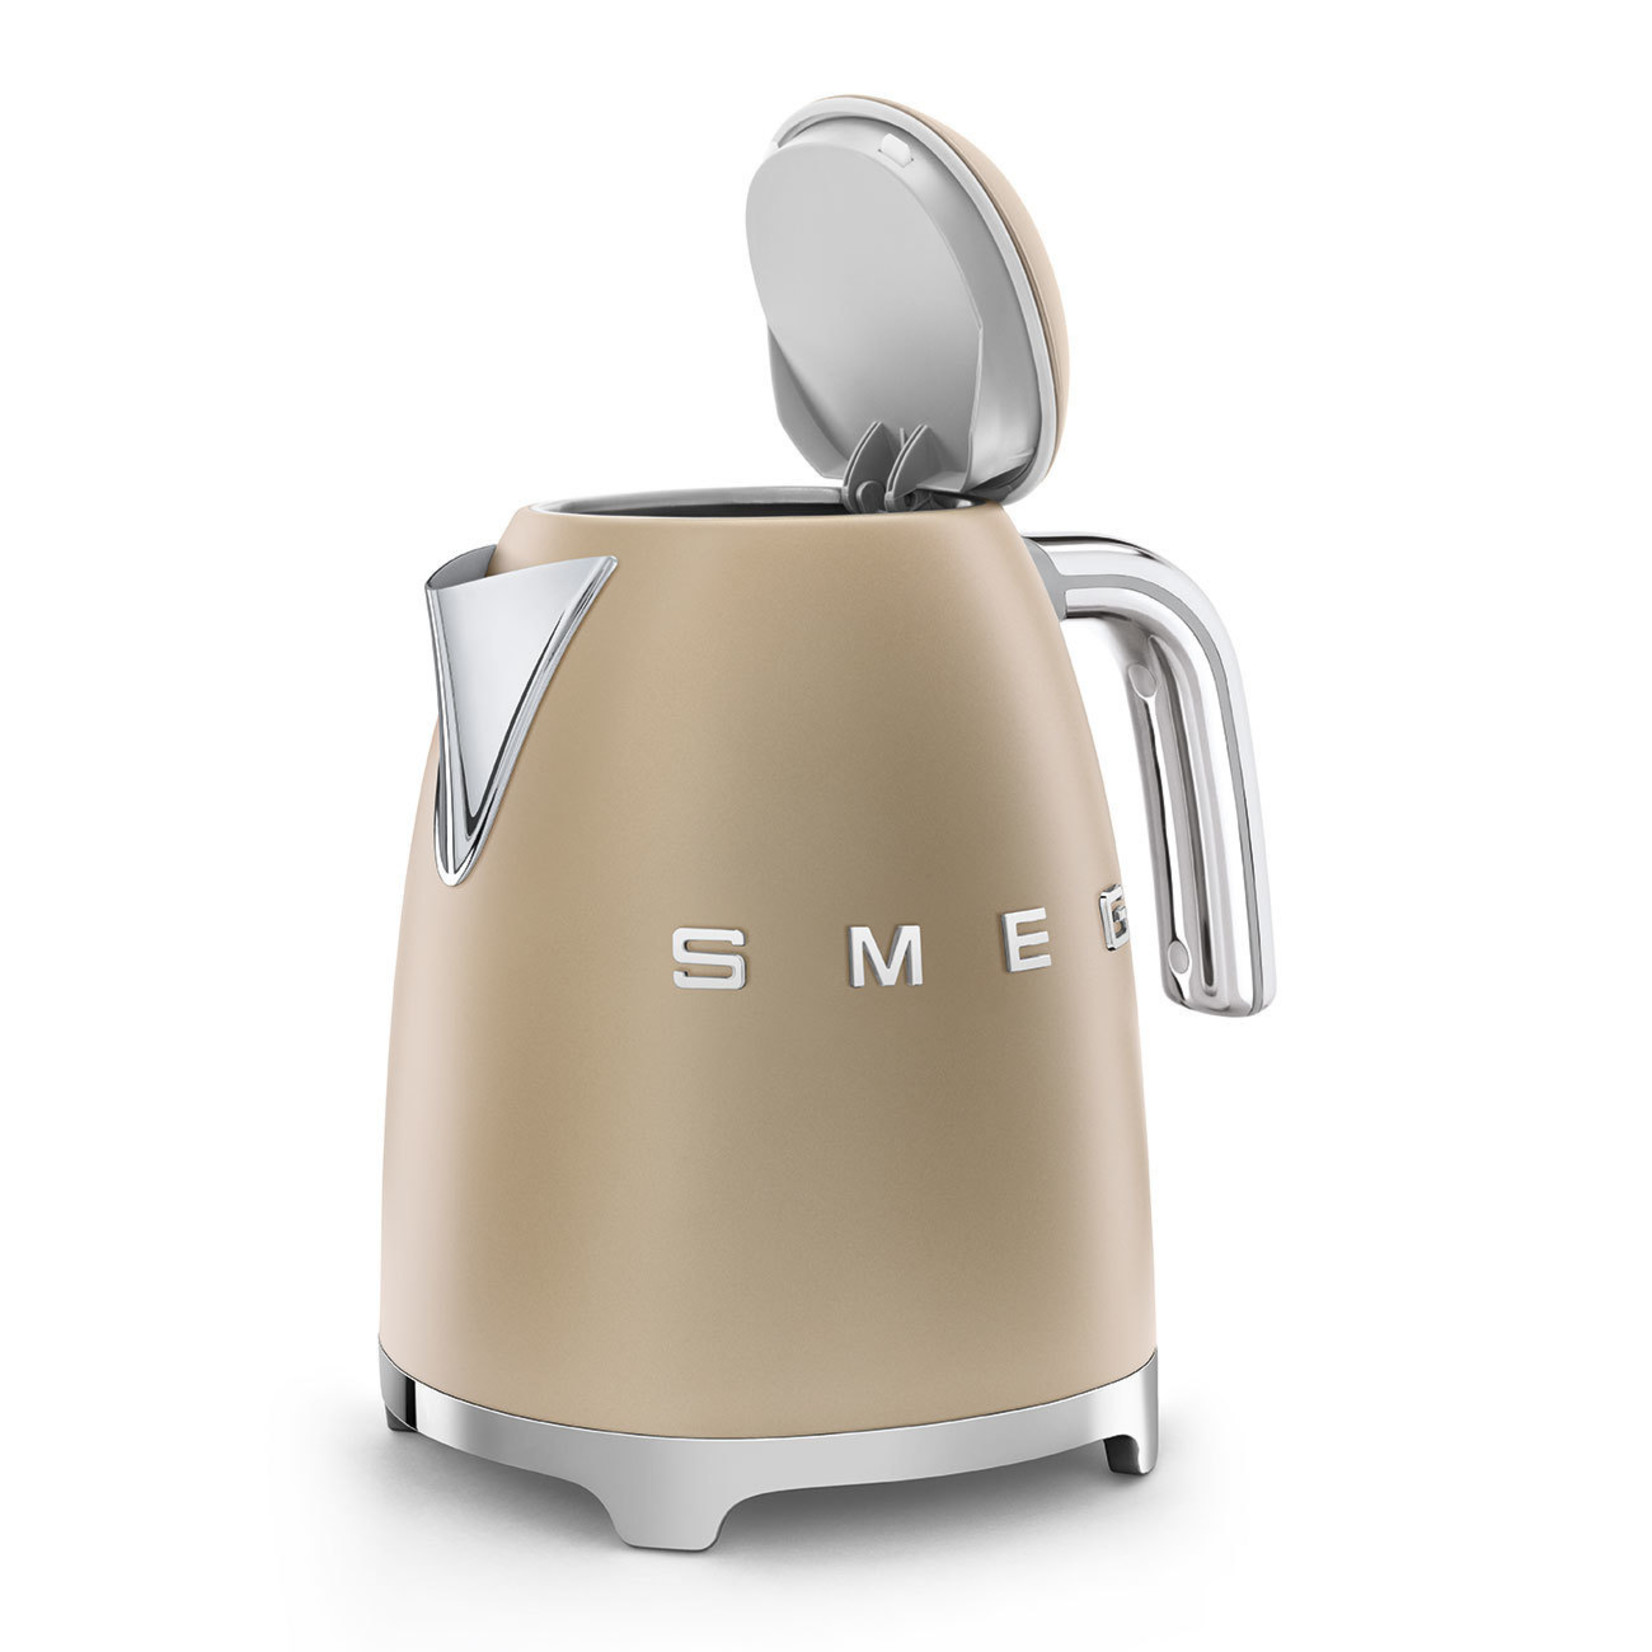 Smeg Smeg waterkoker KLF03CHMEU 1,7 liter champagne